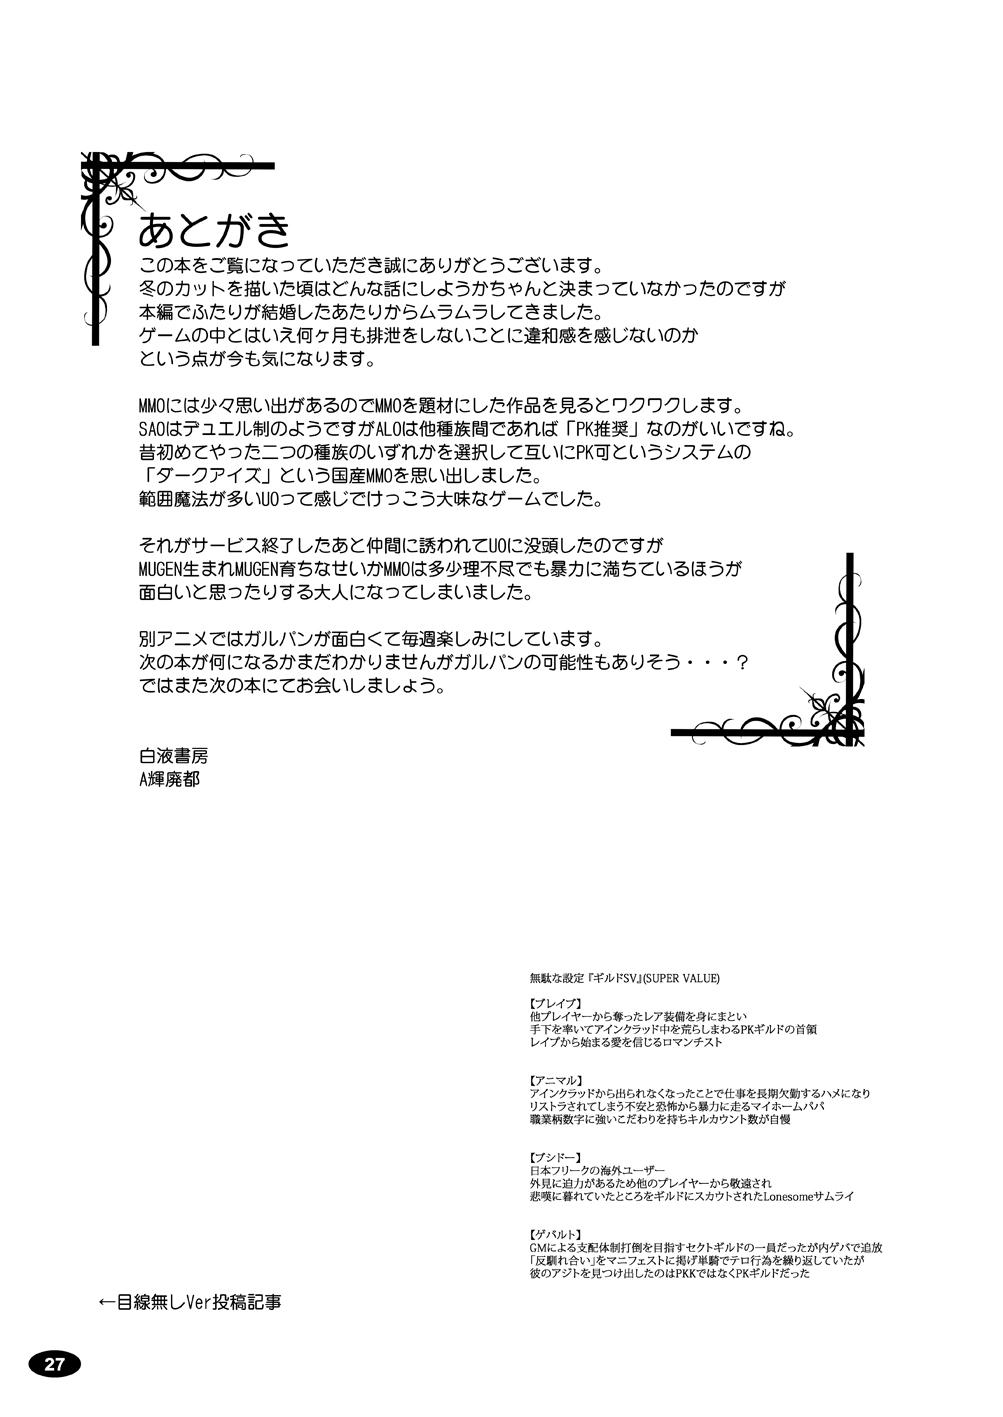 Mesubuta ART IFLINE 25